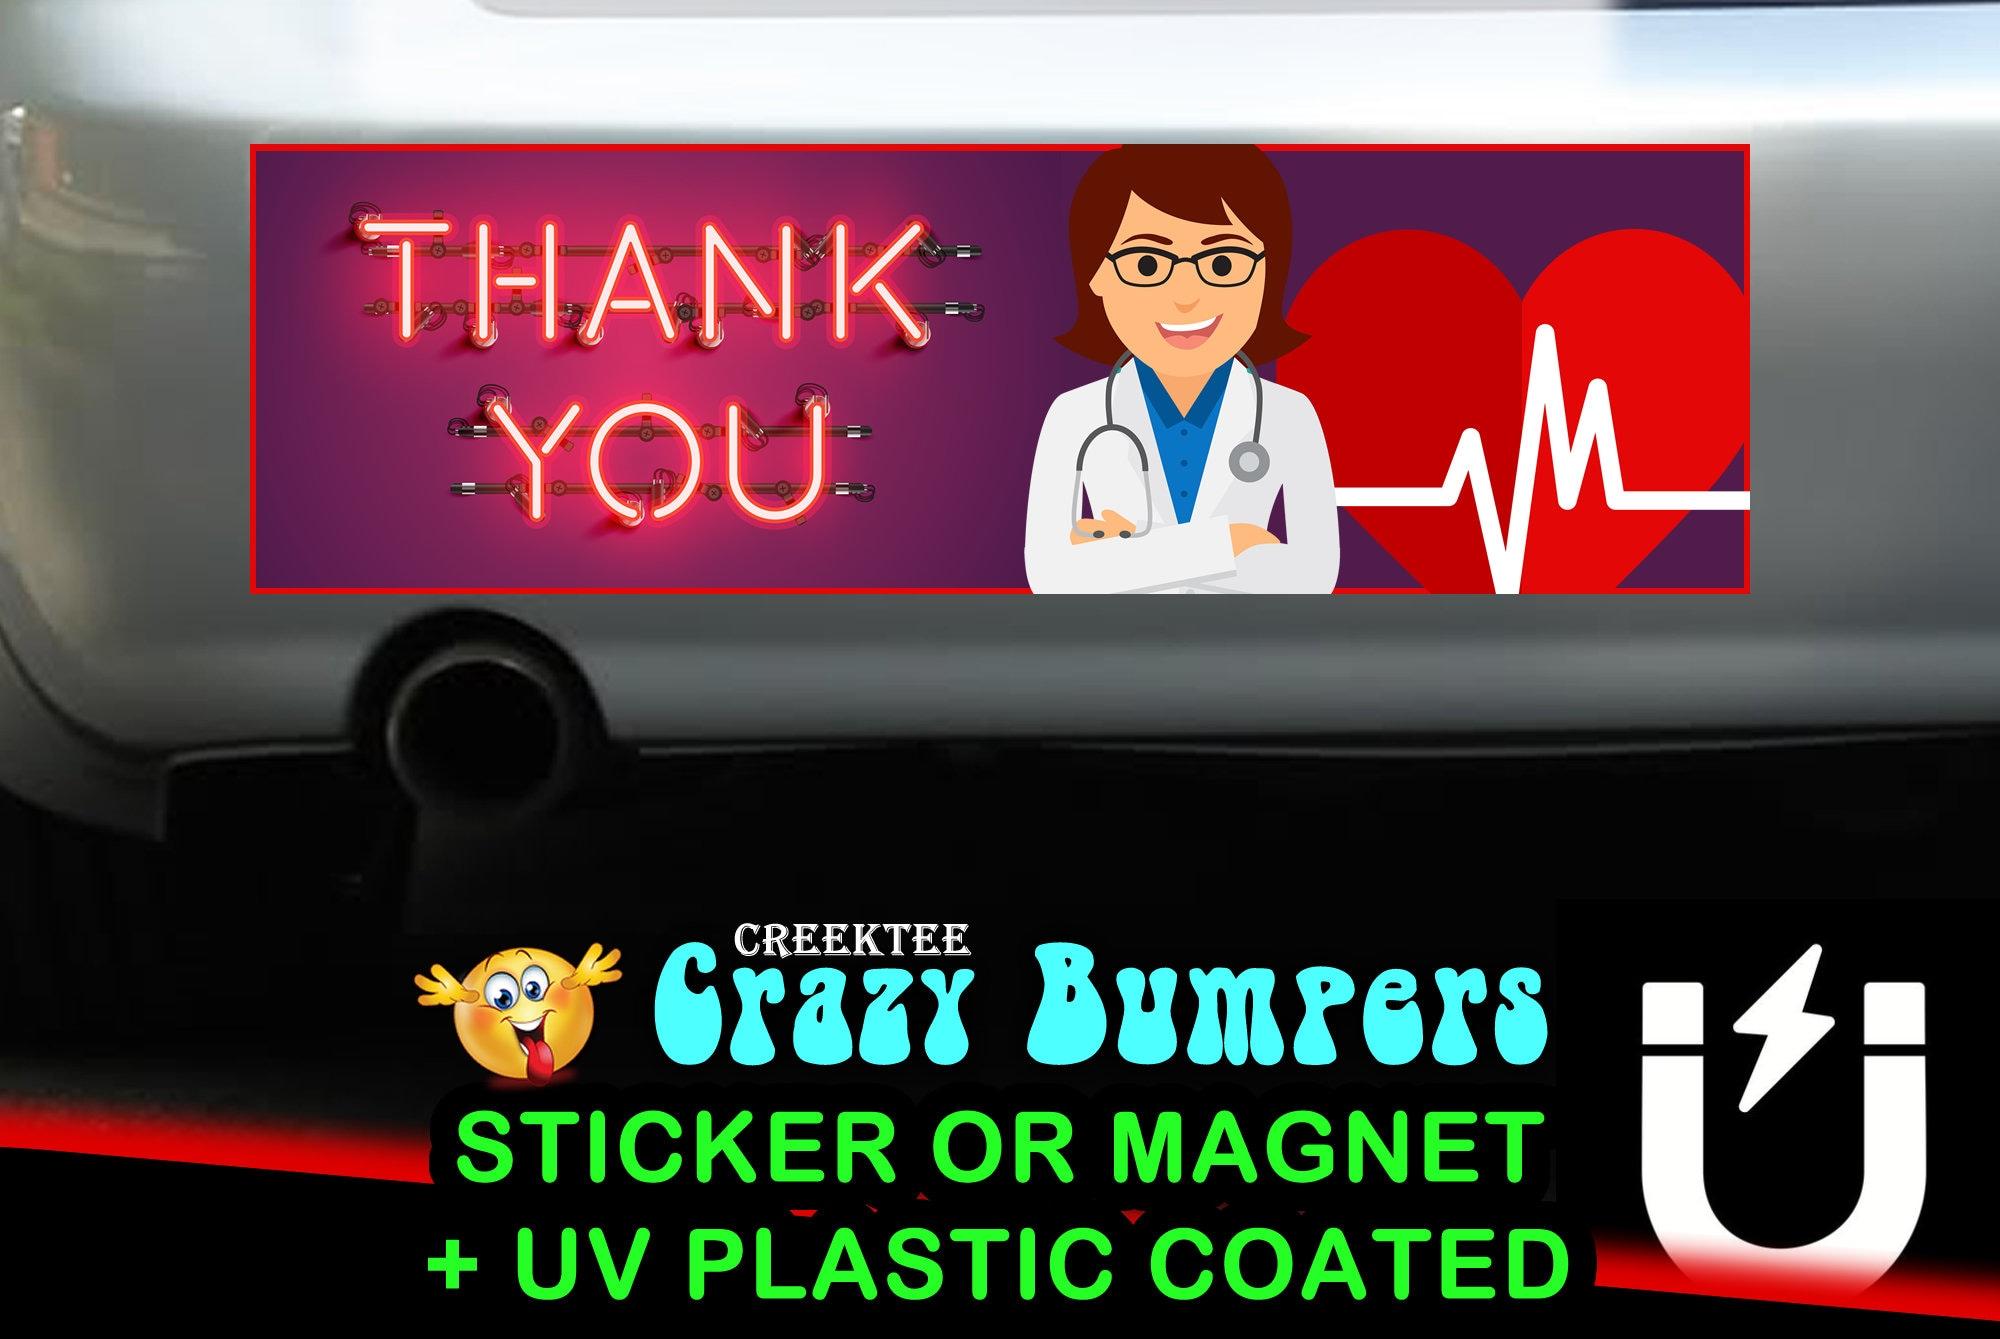 CAD$8.69 - Thank You Doctors Nurses Medic Staff sticker or magnet, 9 x 2.7 or 10 x 3 Sticker Magnet or bumper sticker or bumper magnet